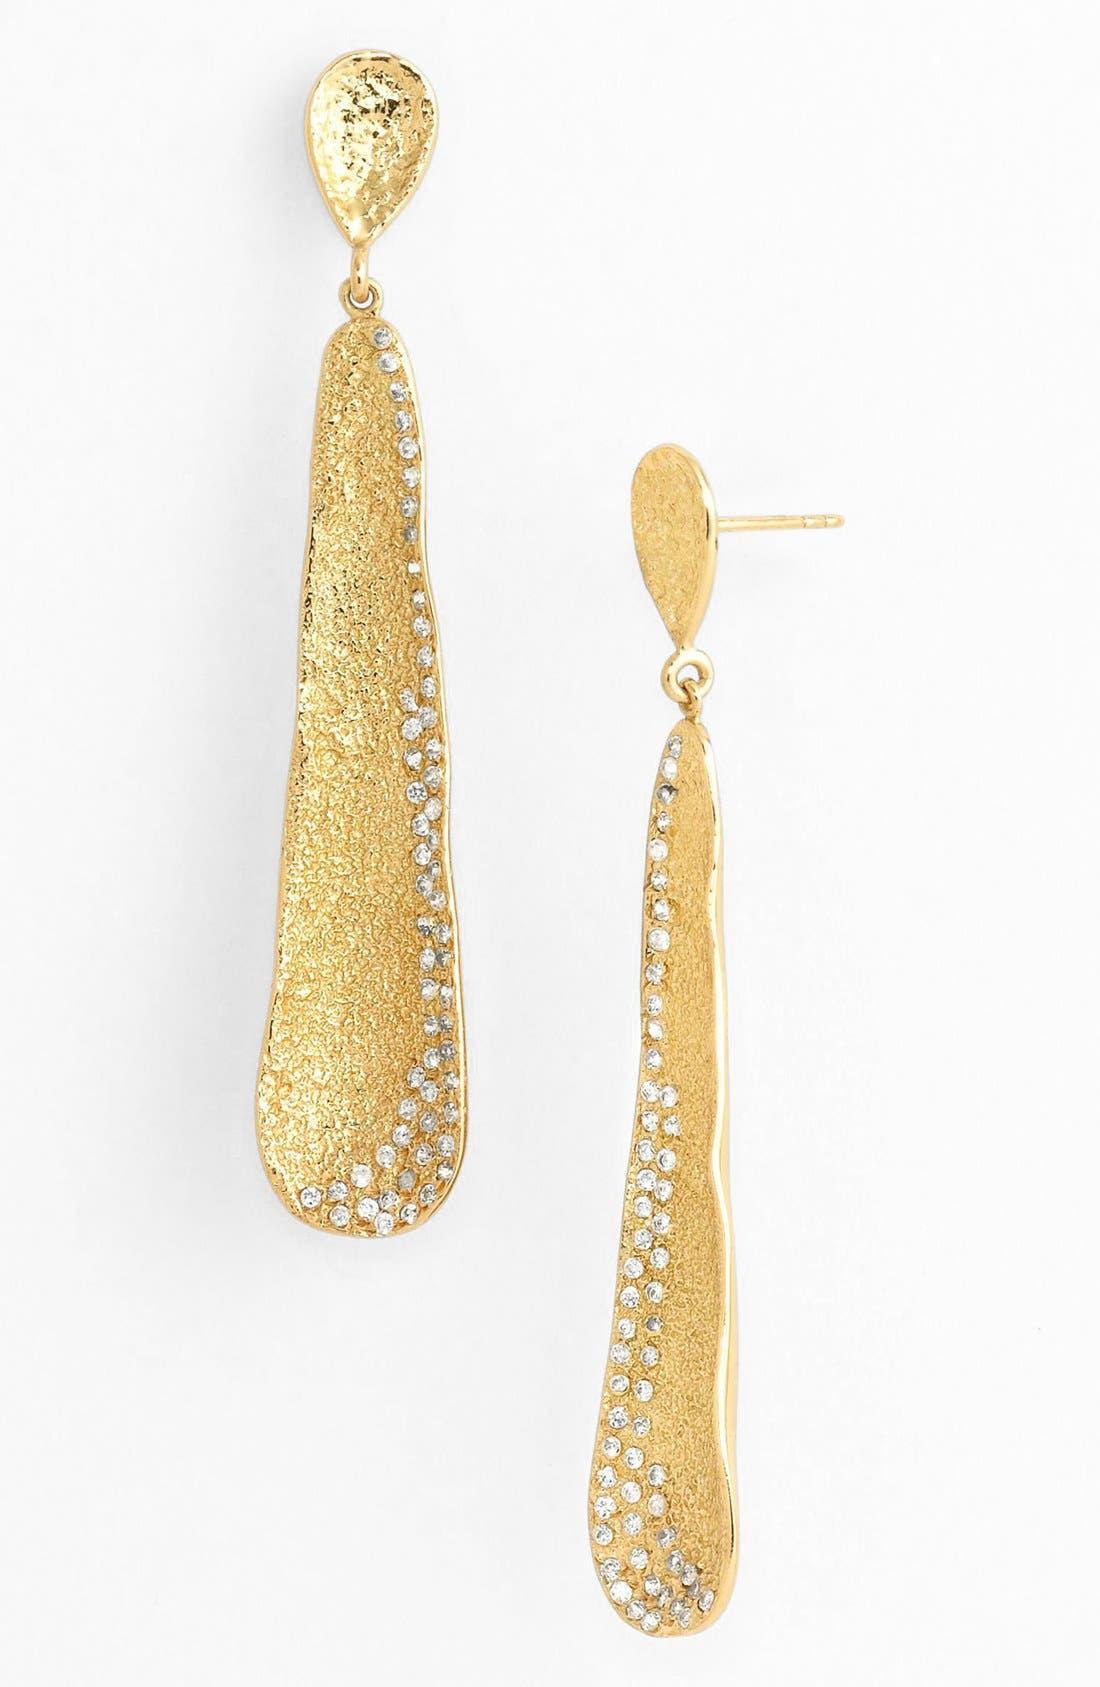 Main Image - Melinda Maria 'Hepburn' Pod Earrings